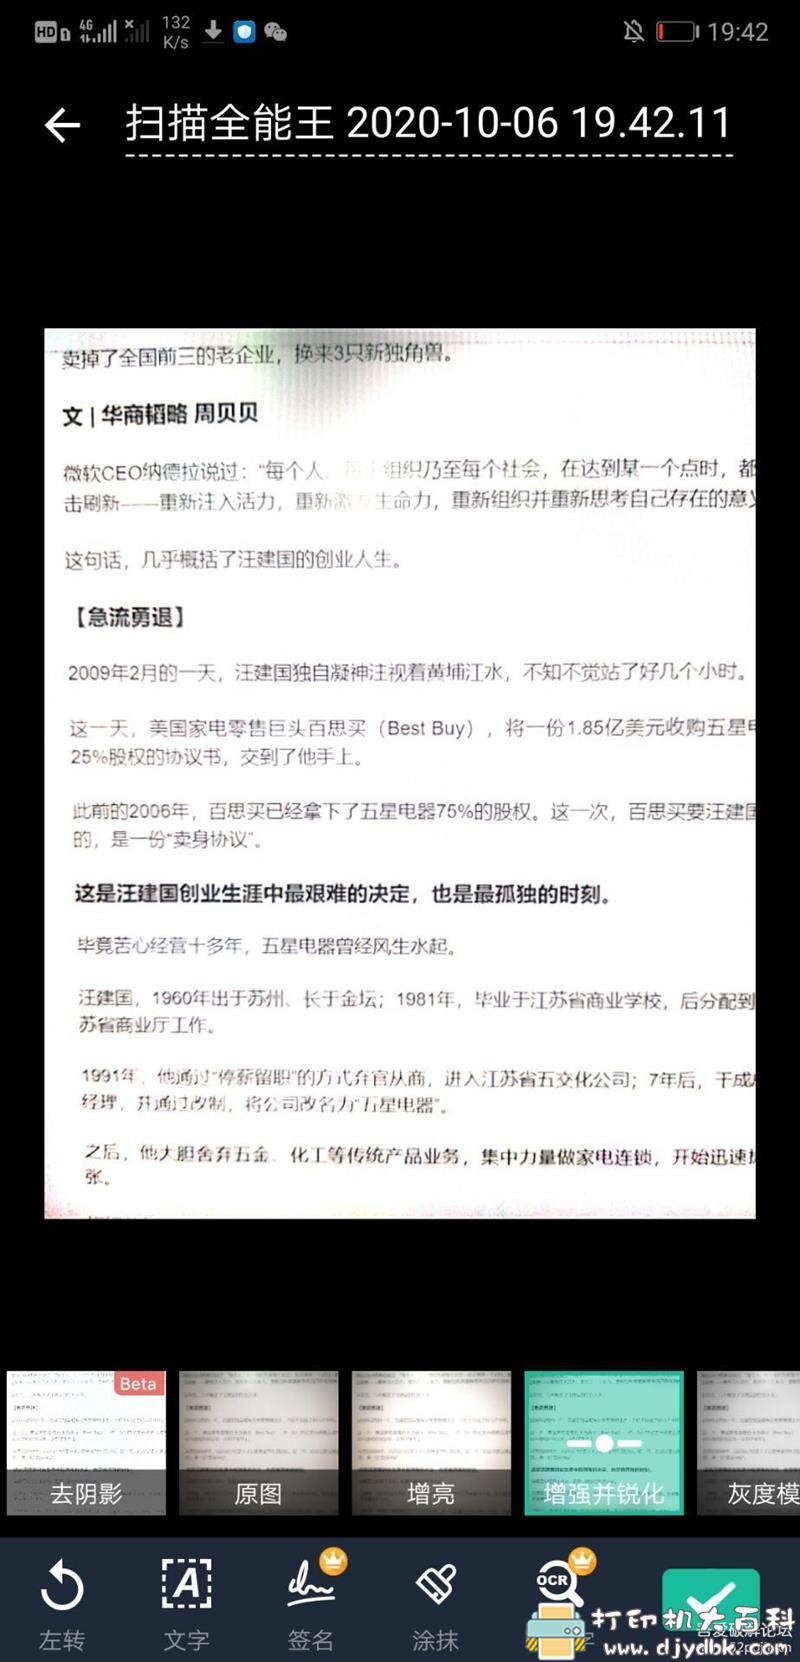 [Android]扫描全能王 v5.25 全功能版(ocr文字识别,证件照扫描) 配图 No.1